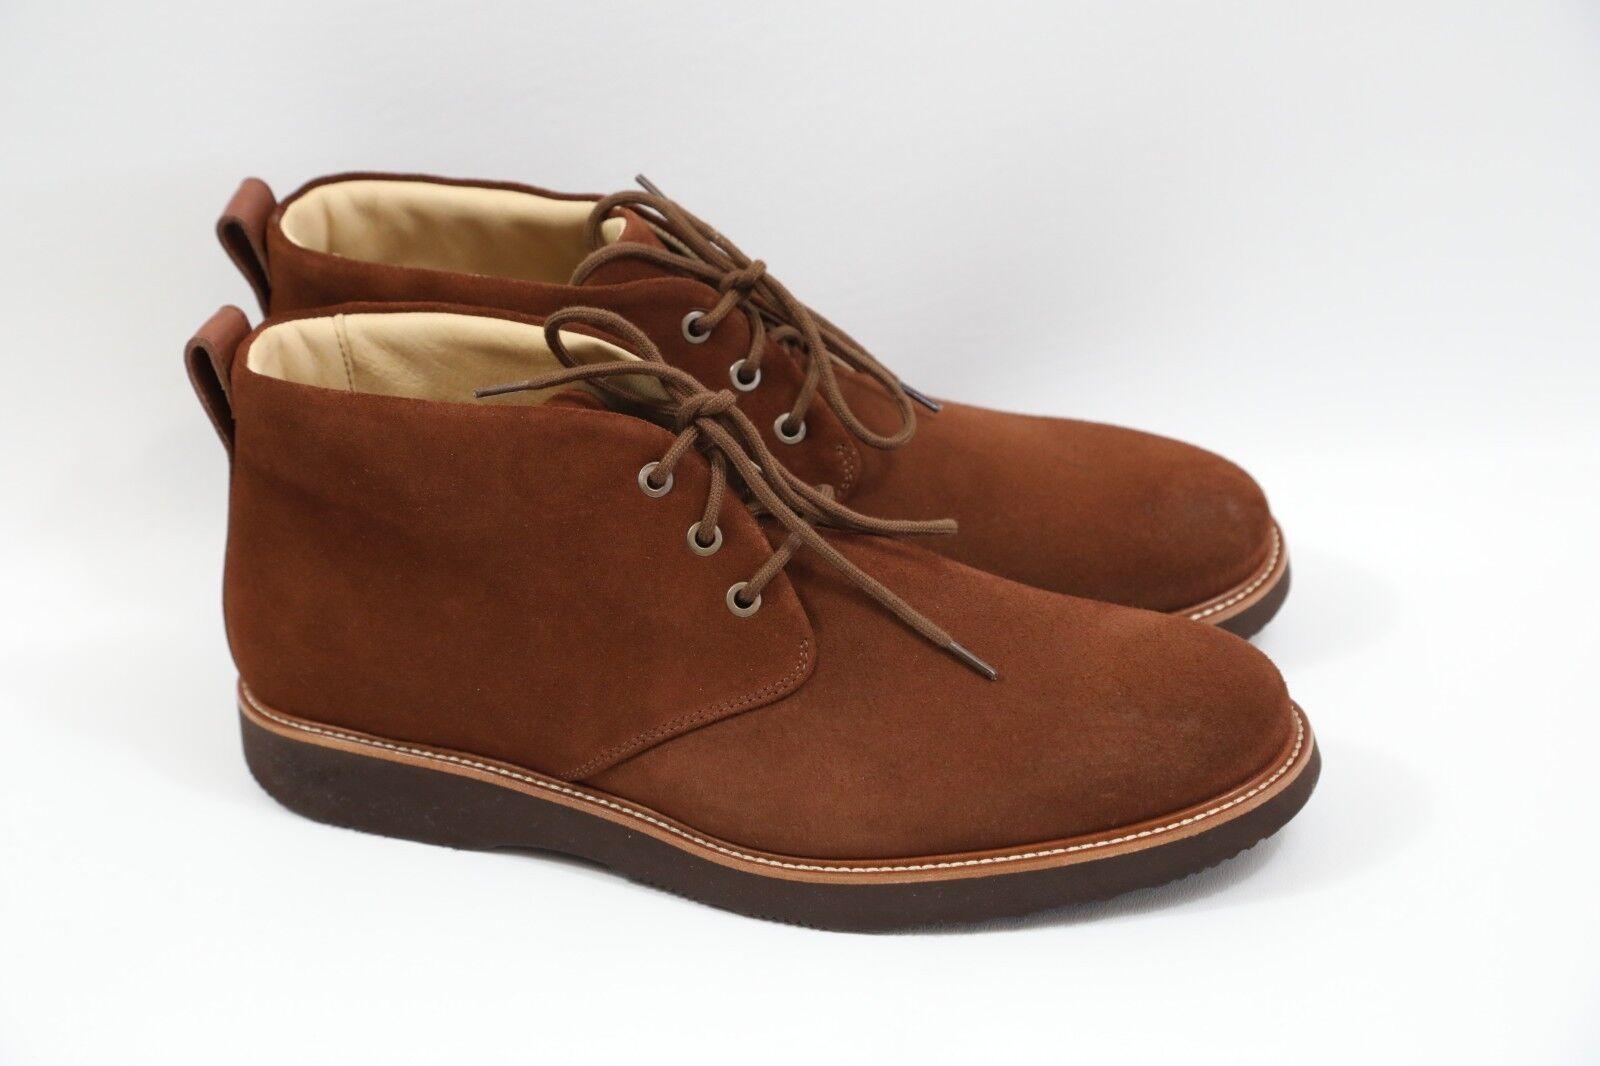 11 Samuel Hubbard Re-Boot Chukka Boots Size 11.5 M  RETAIL  260